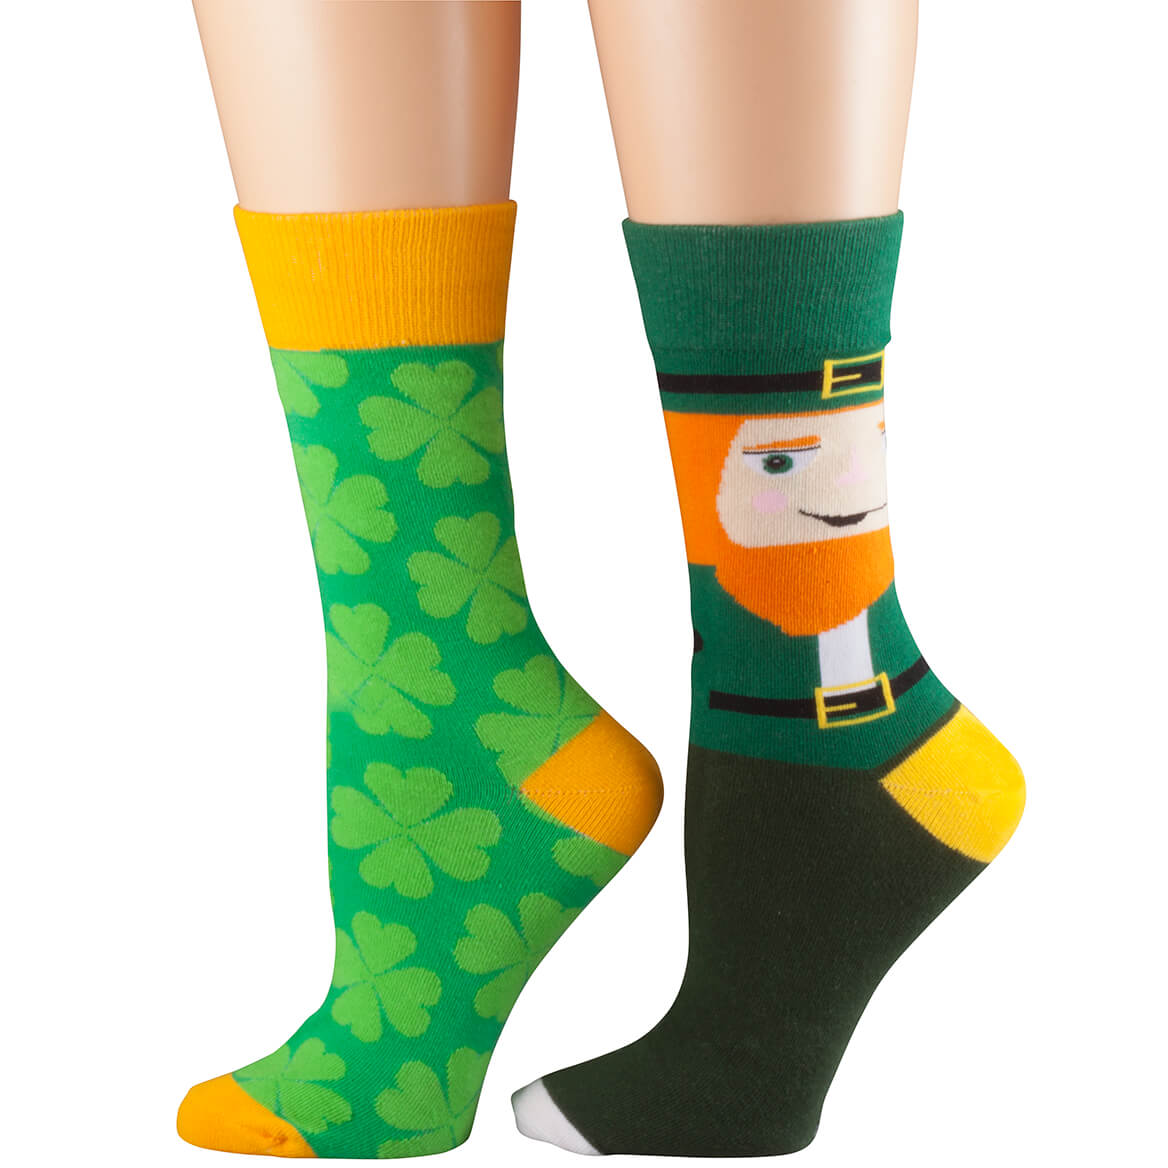 Leprechaun and Shamrock Socks, Set of 2